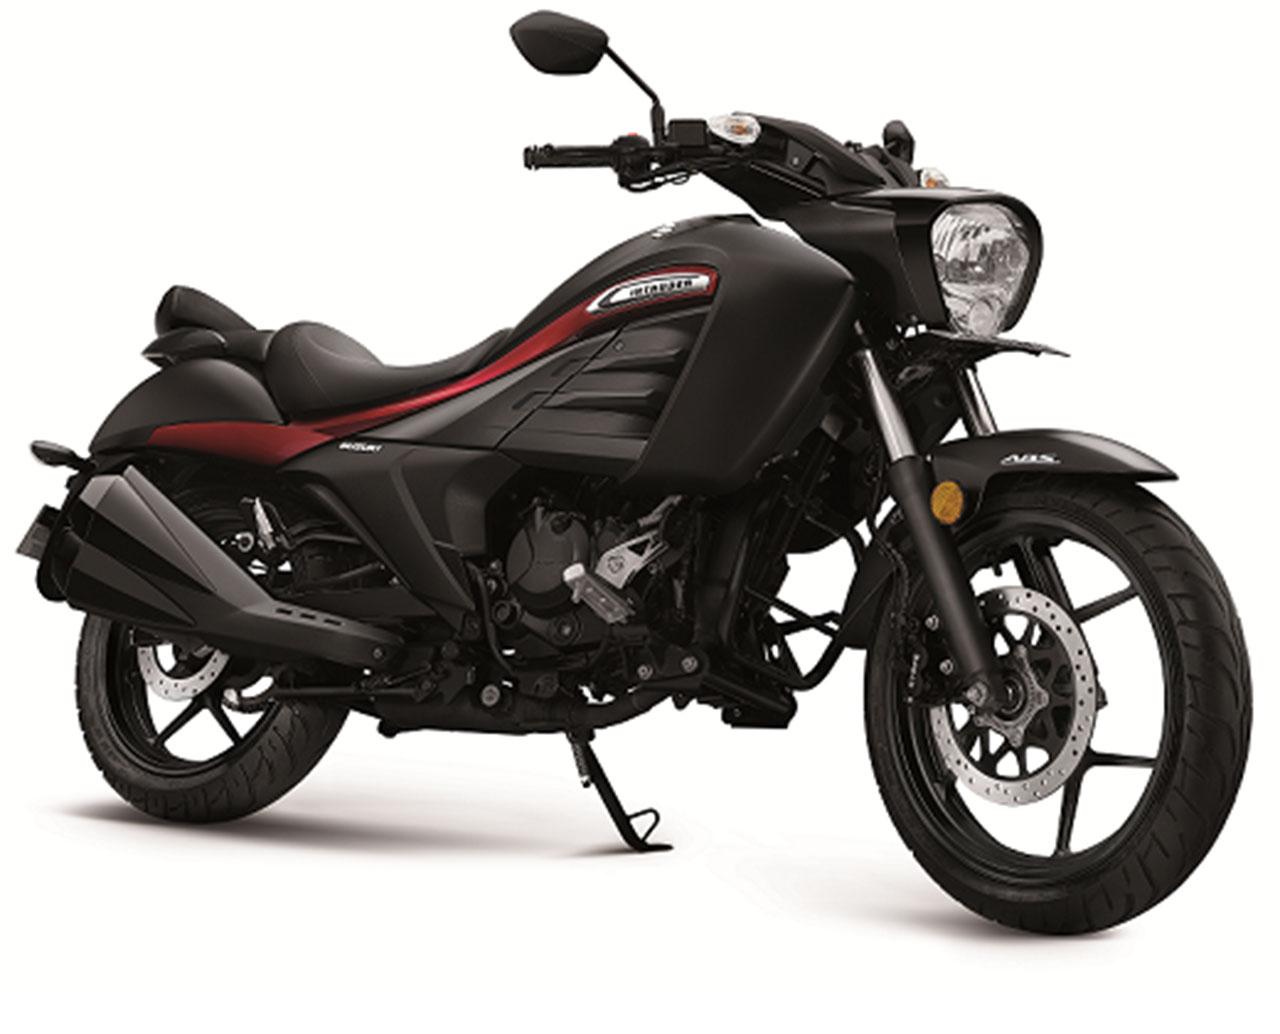 Suzuki Intruder 150 (for reference)